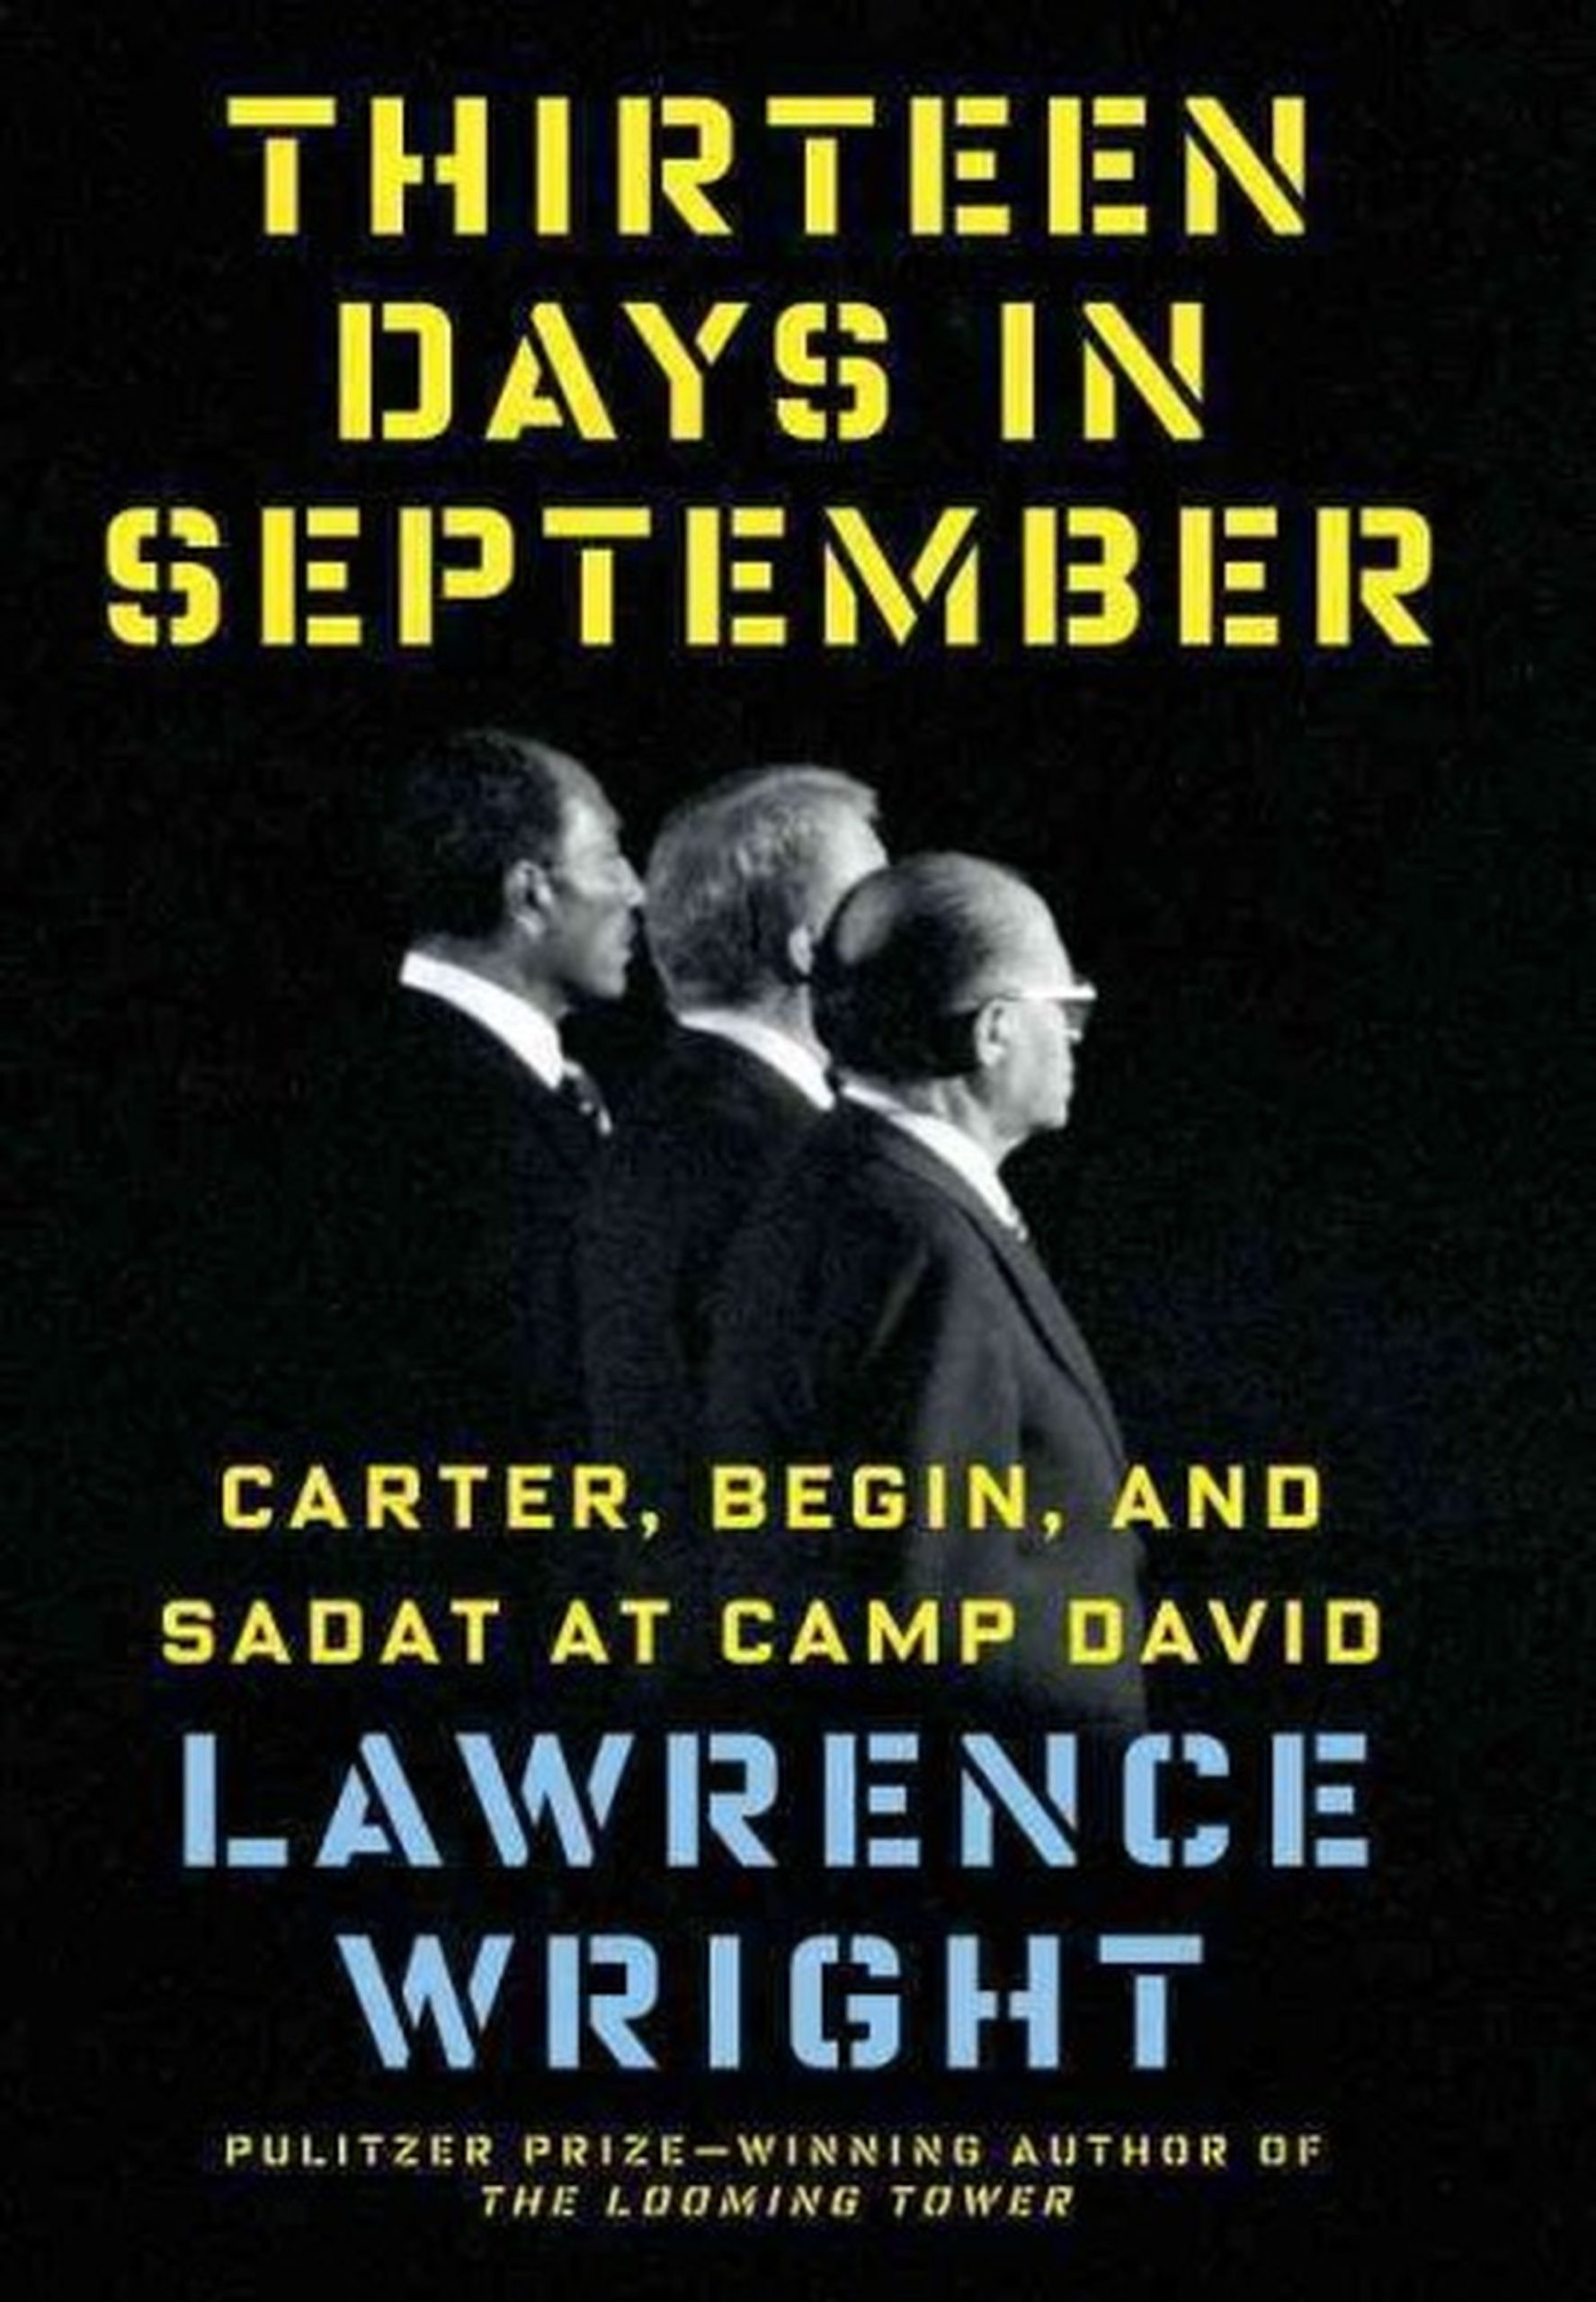 Lawrence Wright: Thirteen Days in September. Carter, Begin and Sadat at Camp David. Knopf 2014, 289 s.